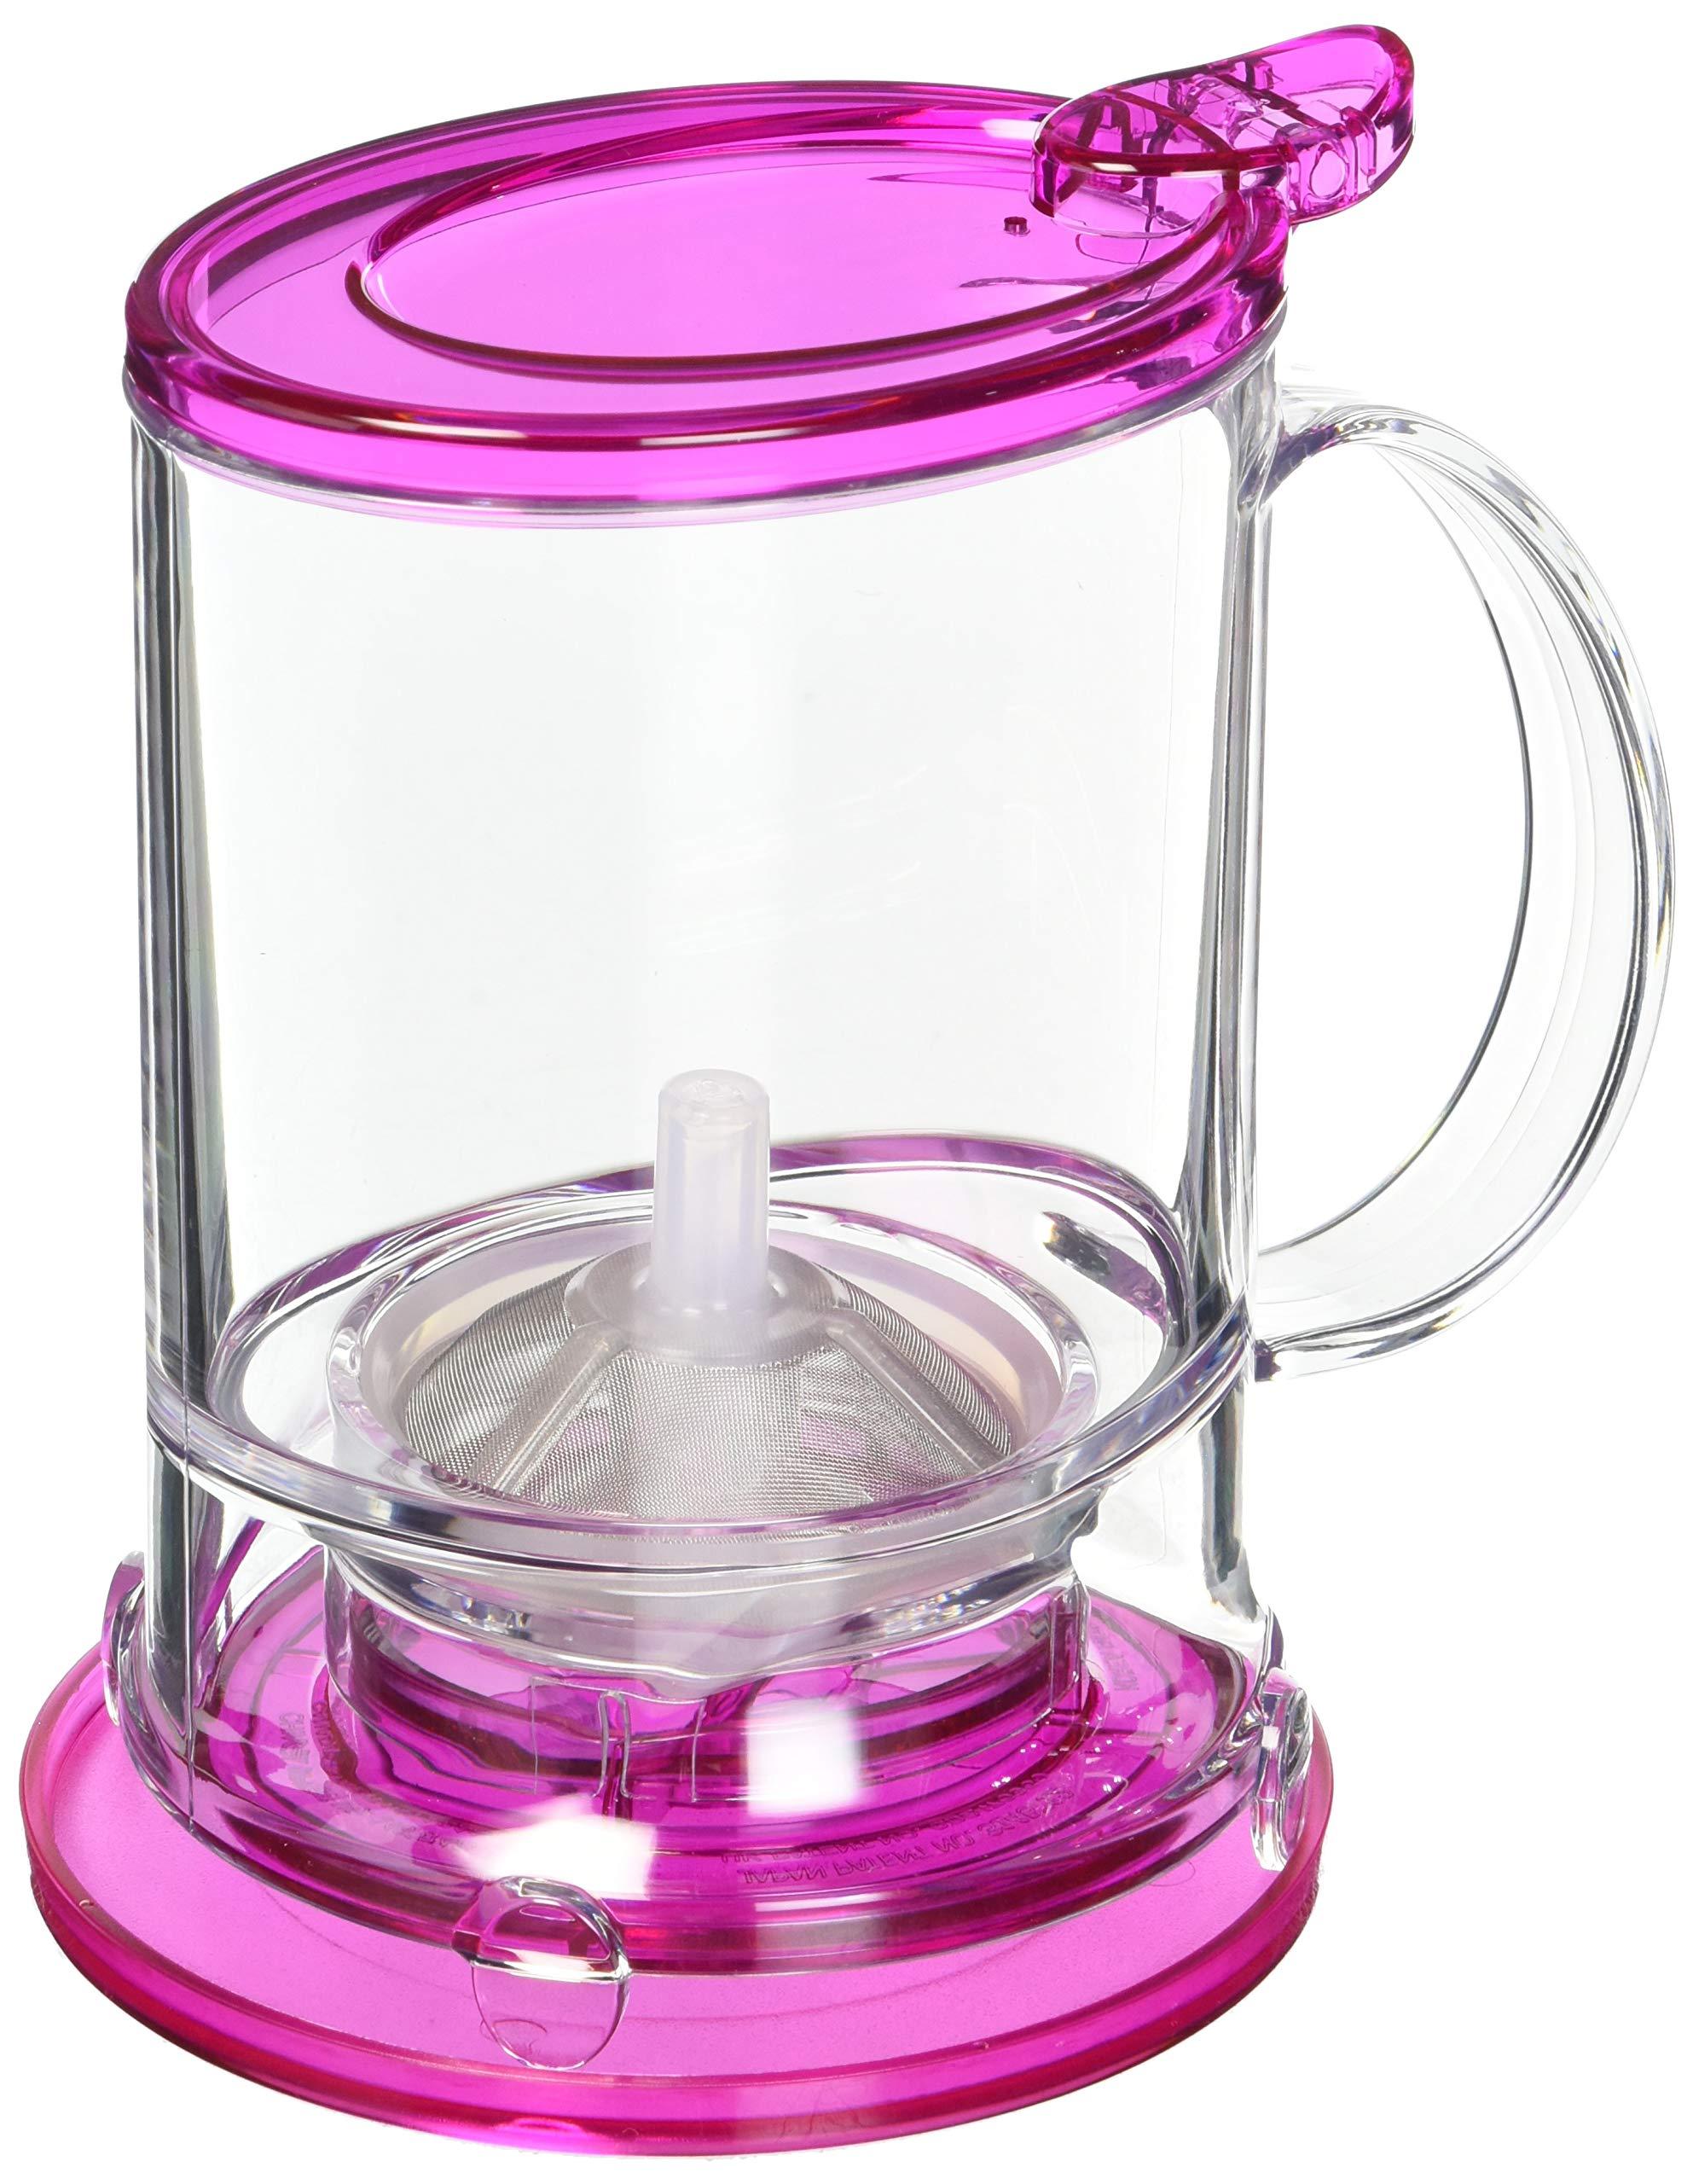 Teavana Perfectea Maker, Pink, 16 Ounces